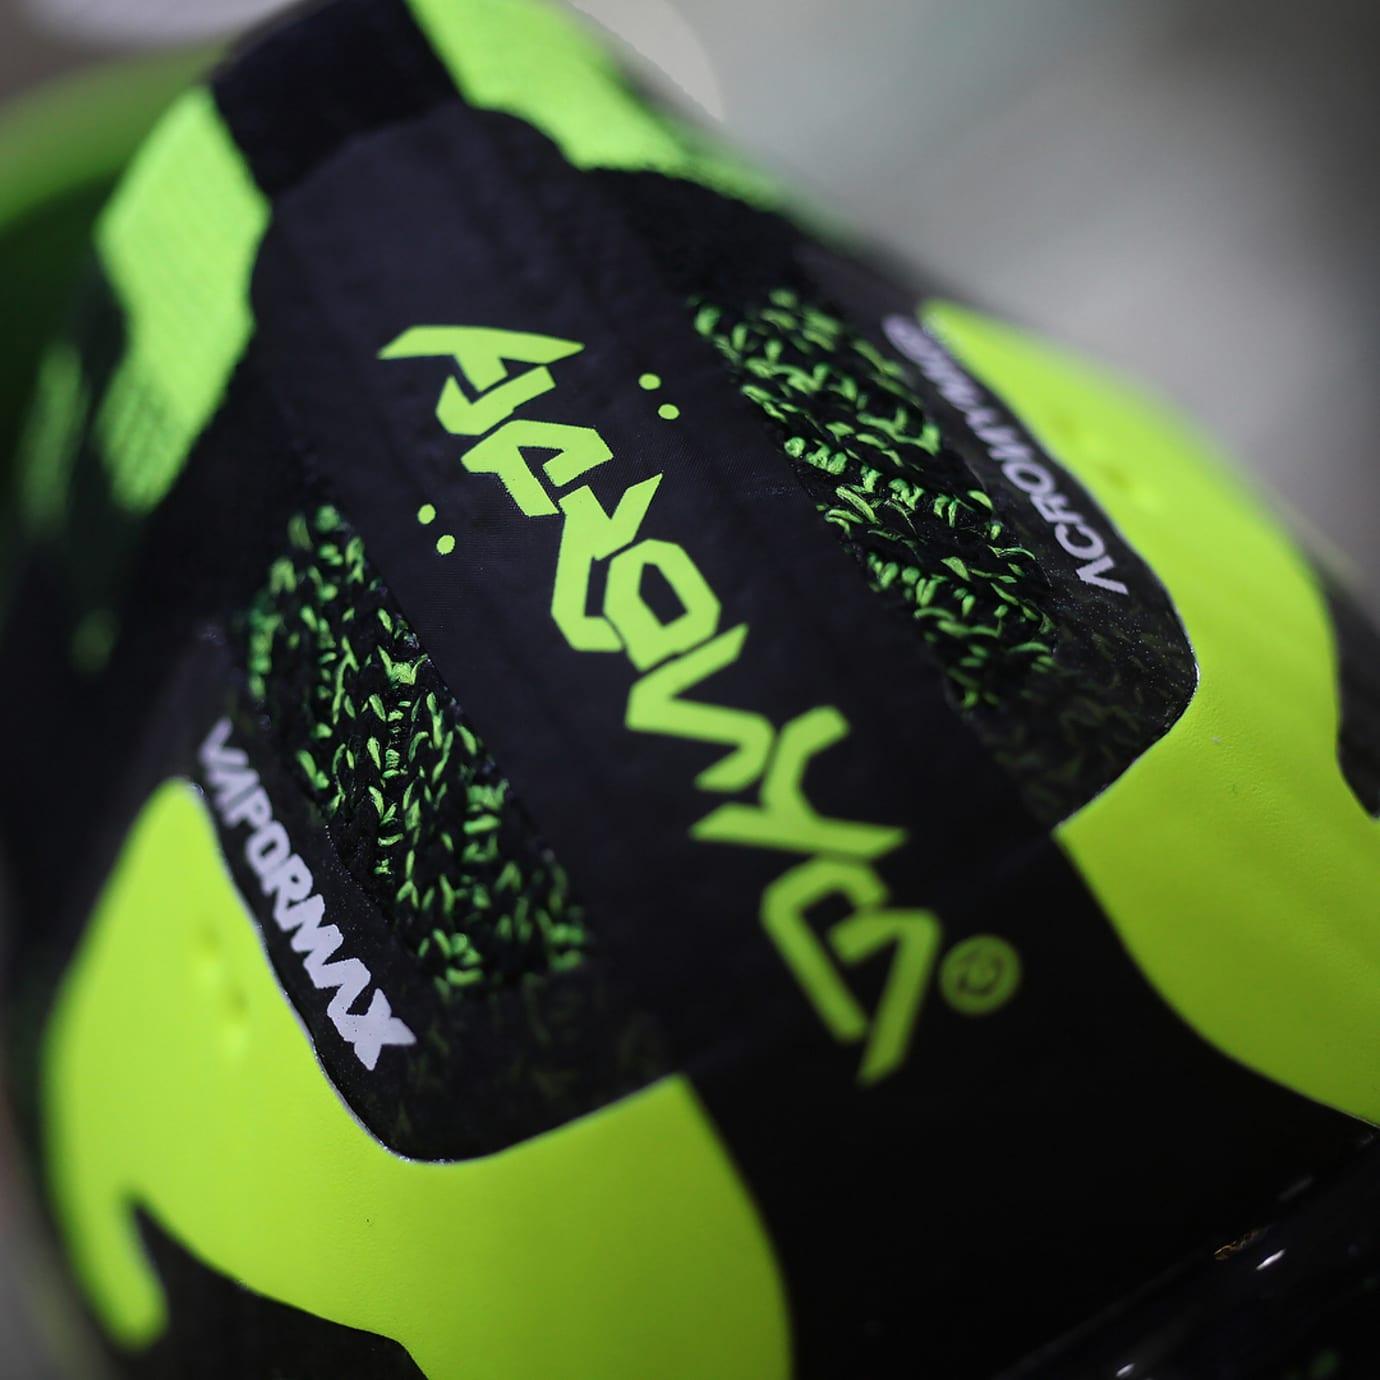 6389109ba6 Acronym x Nike Air VaporMax Moc 2 Black/Volt AQ0996-007 Detailed ...